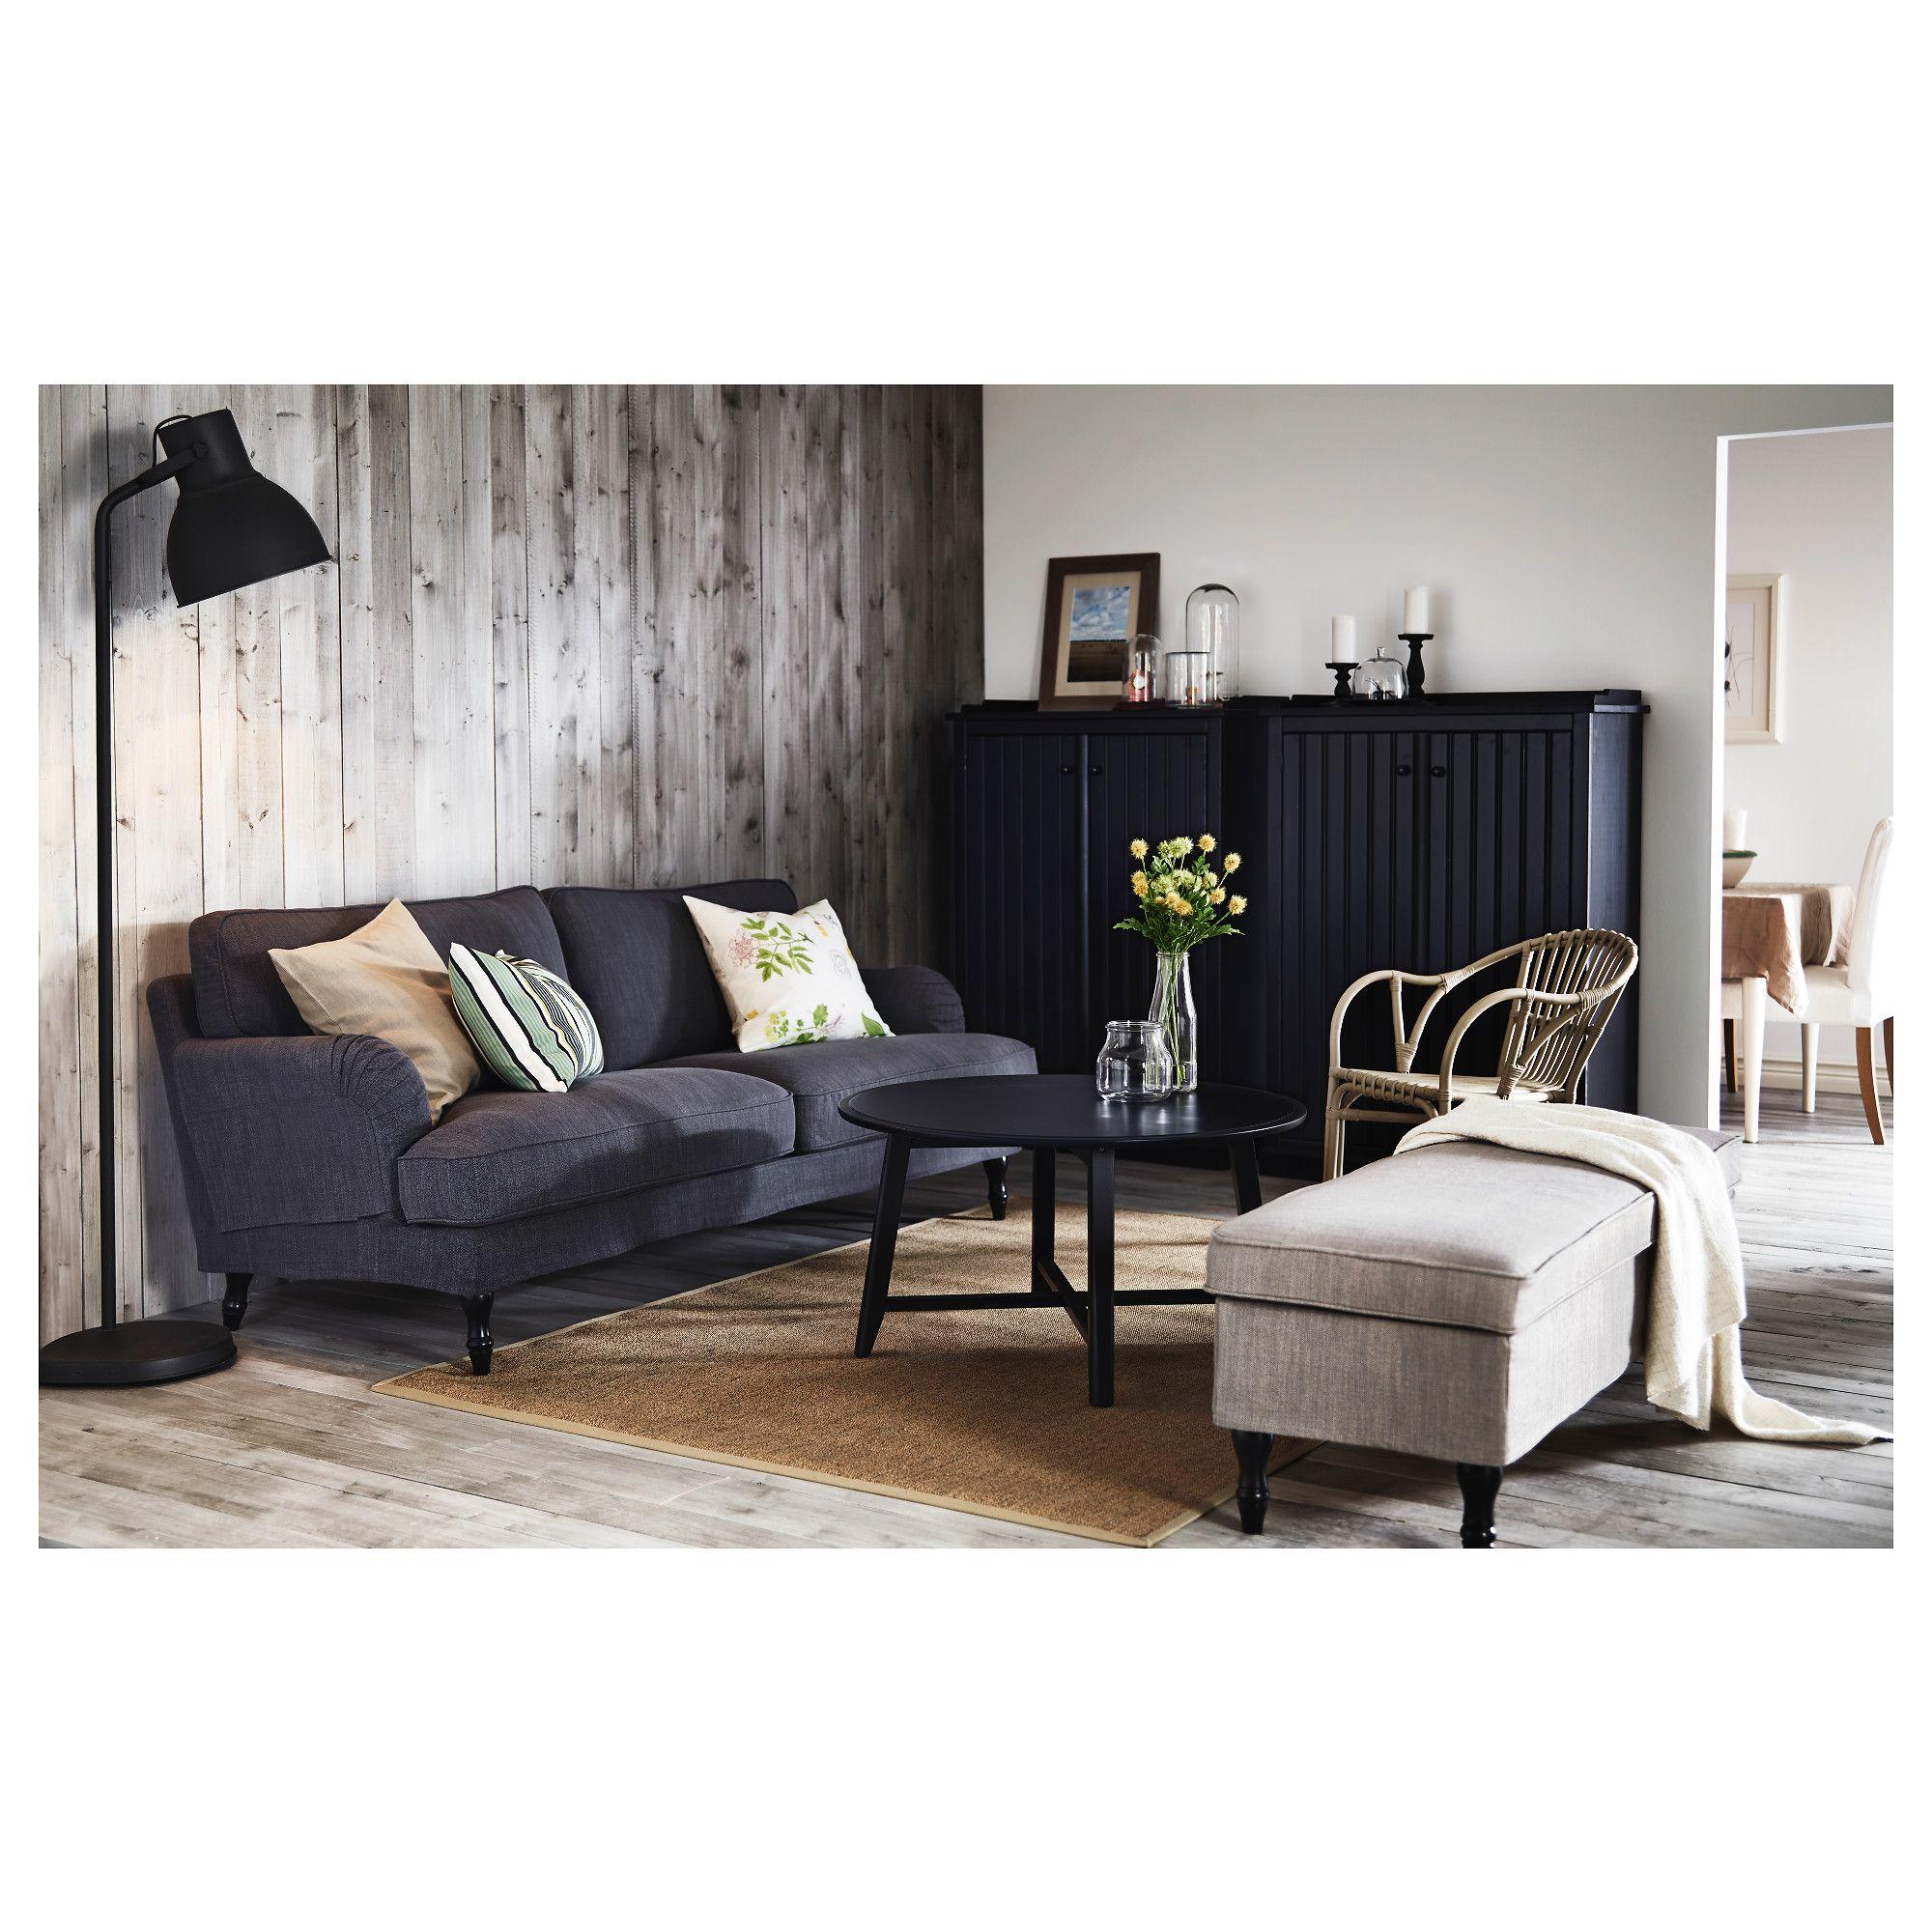 Home Outdoor Furniture Homeware Mobler Kaffebord Hjemmeinnredning [ 2000 x 2000 Pixel ]